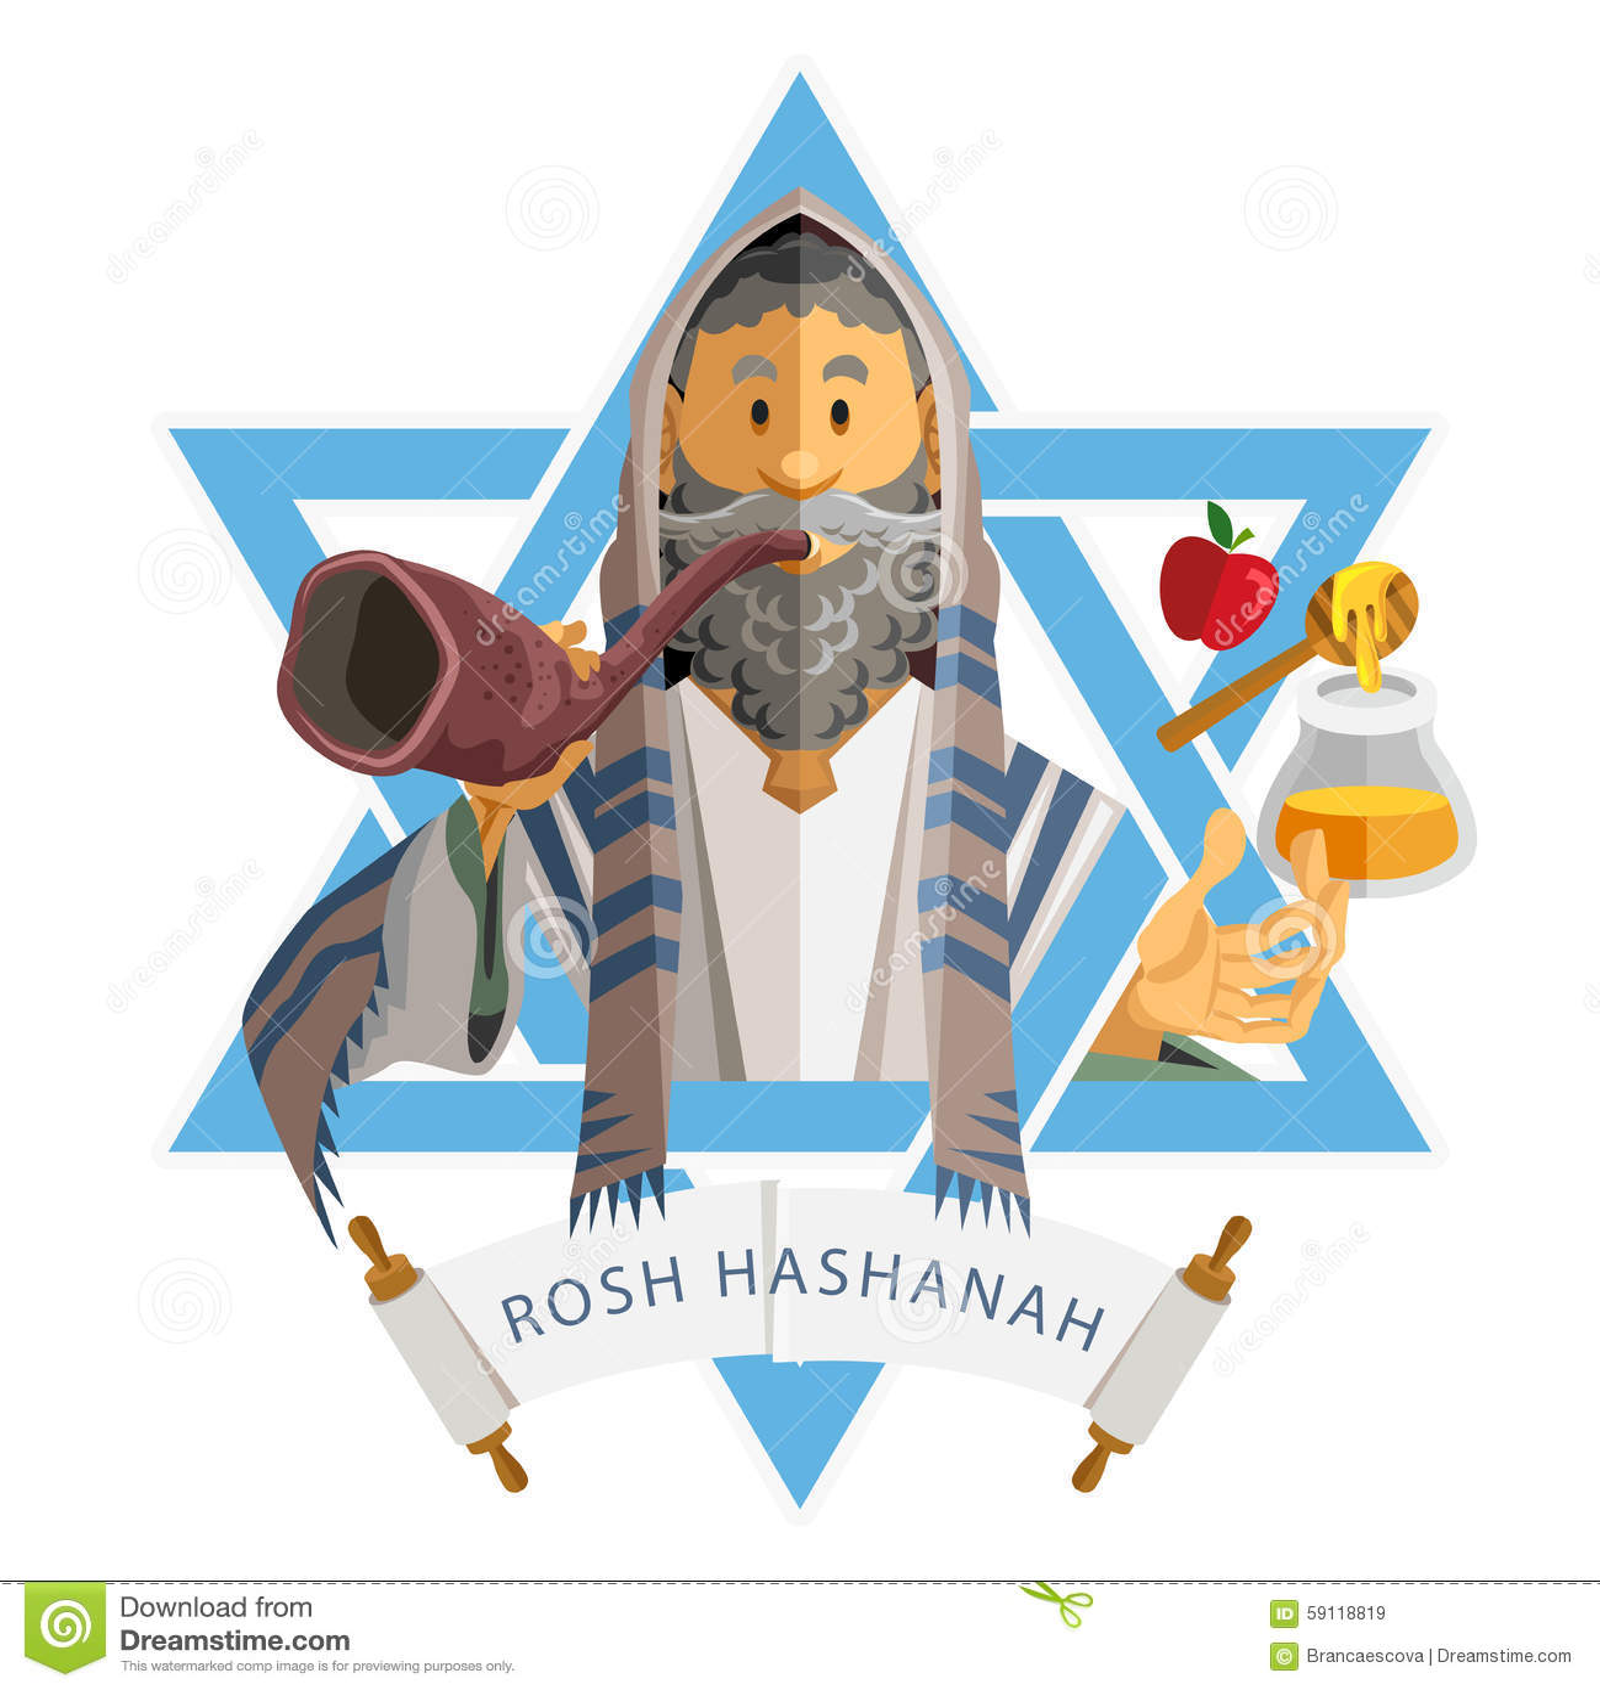 Rosh Hashanah Jewish New Year Yom Kippur Stock Vector Illustration